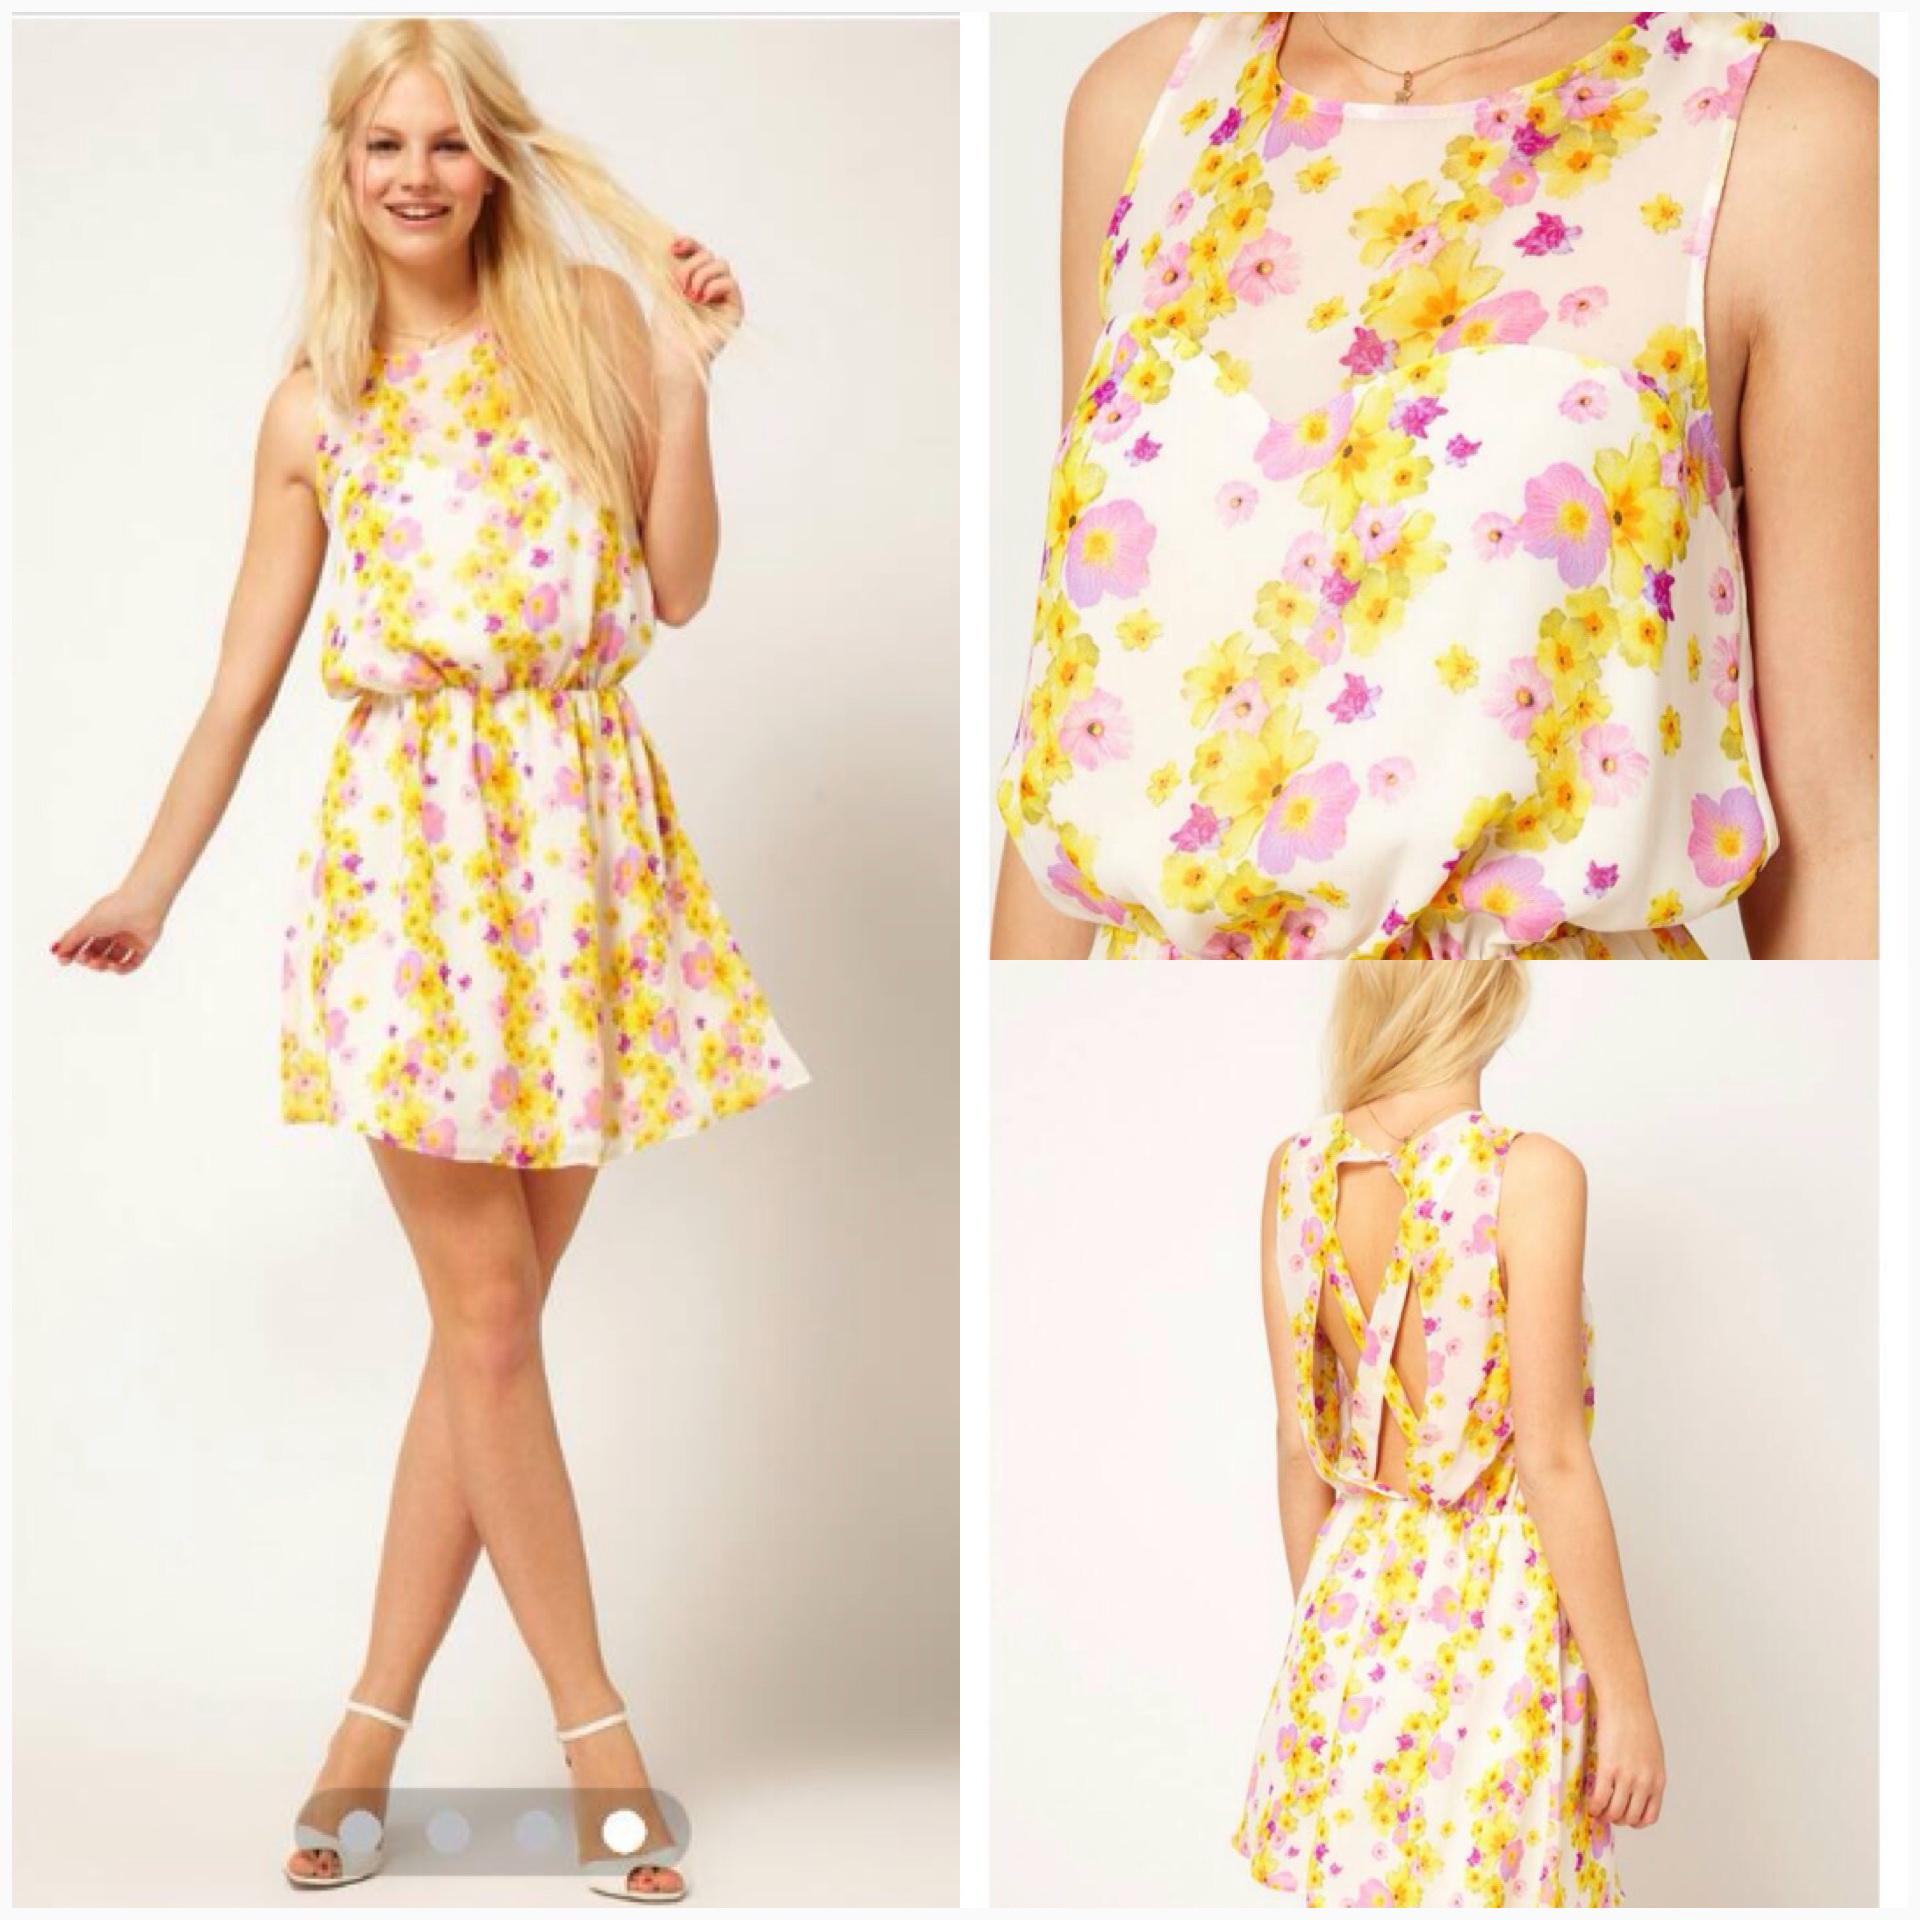 ASOS Floral Dress Size Uk8 =2